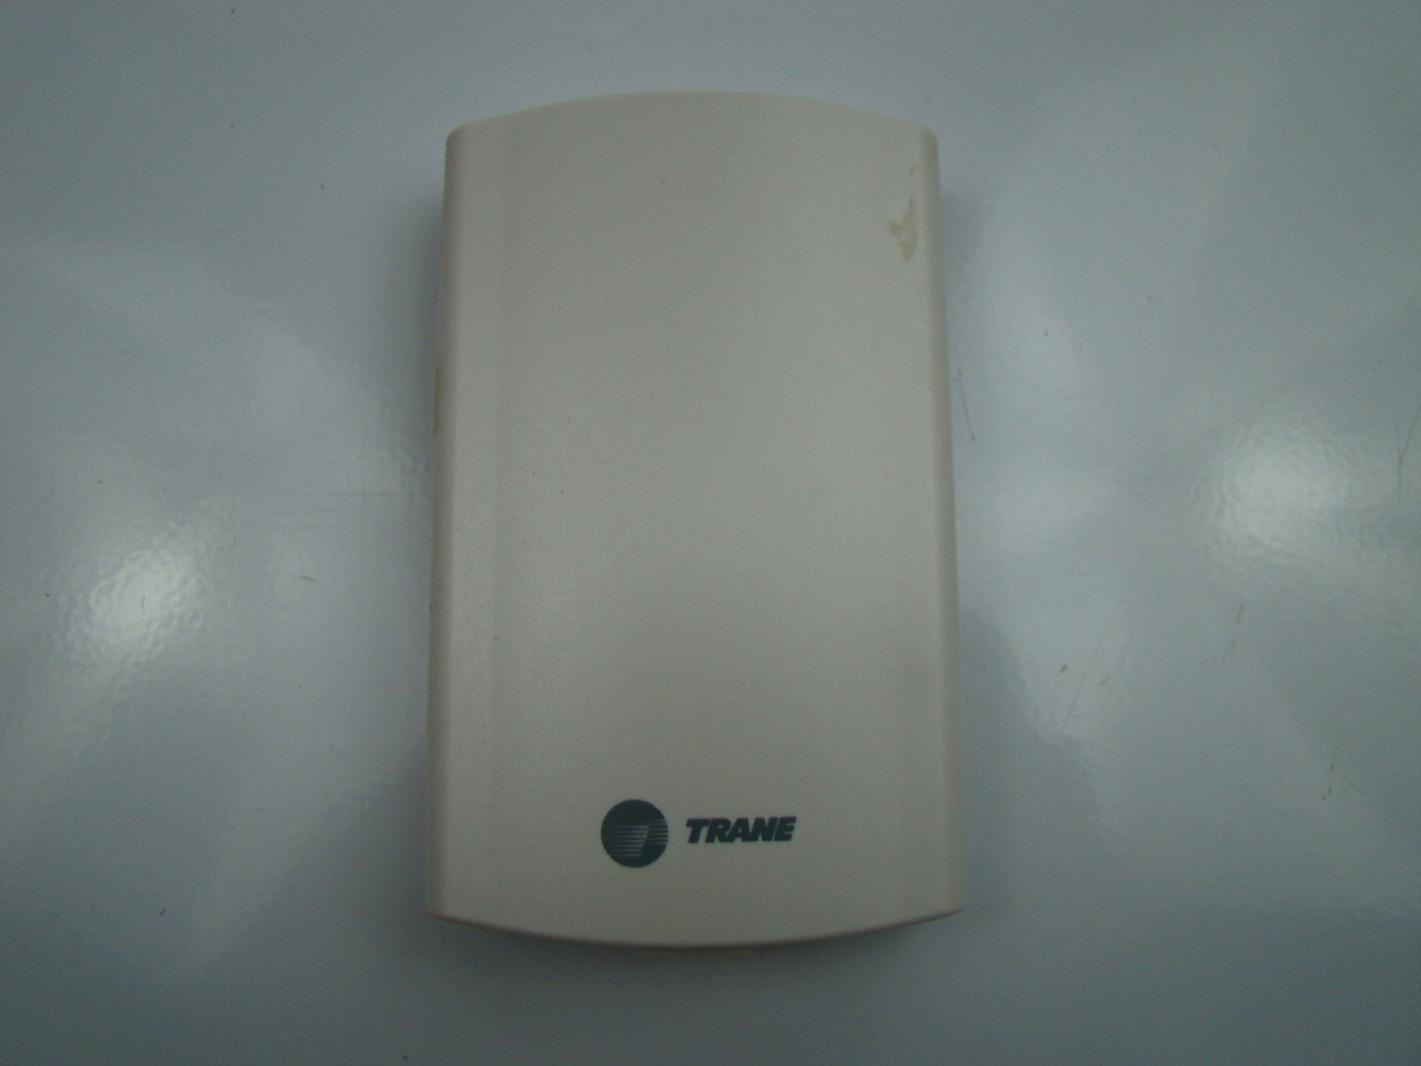 Details about Trane 24 Volt Humidity Sensor OE265 11 #495456